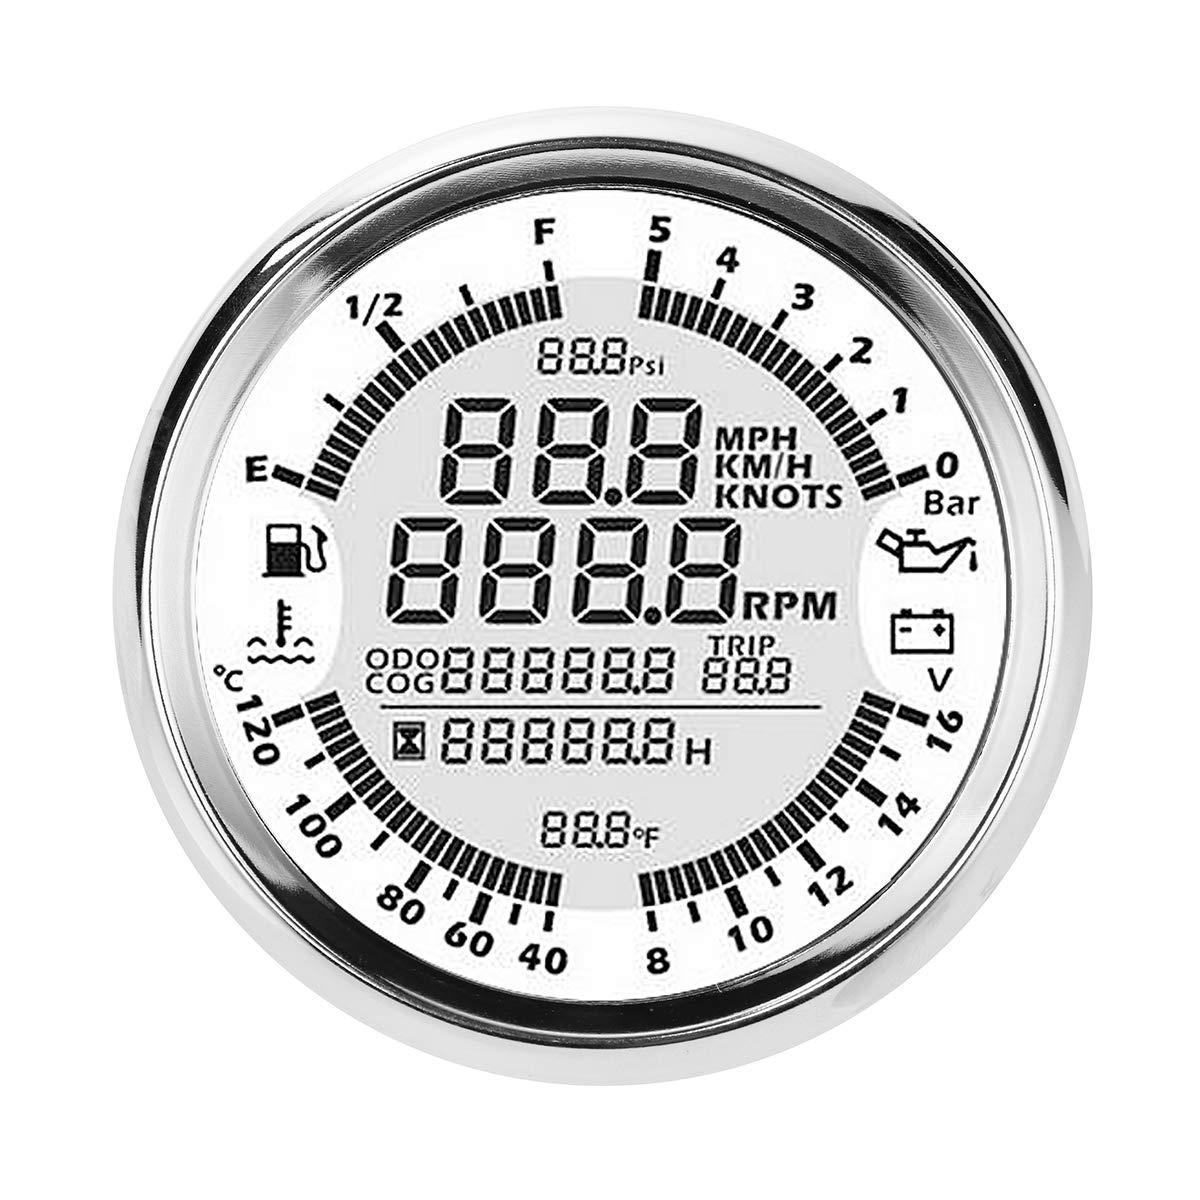 NeDonald 85mm GPS Speedometer Oil Pressure Fuel Gauge Tachometer with Antenna